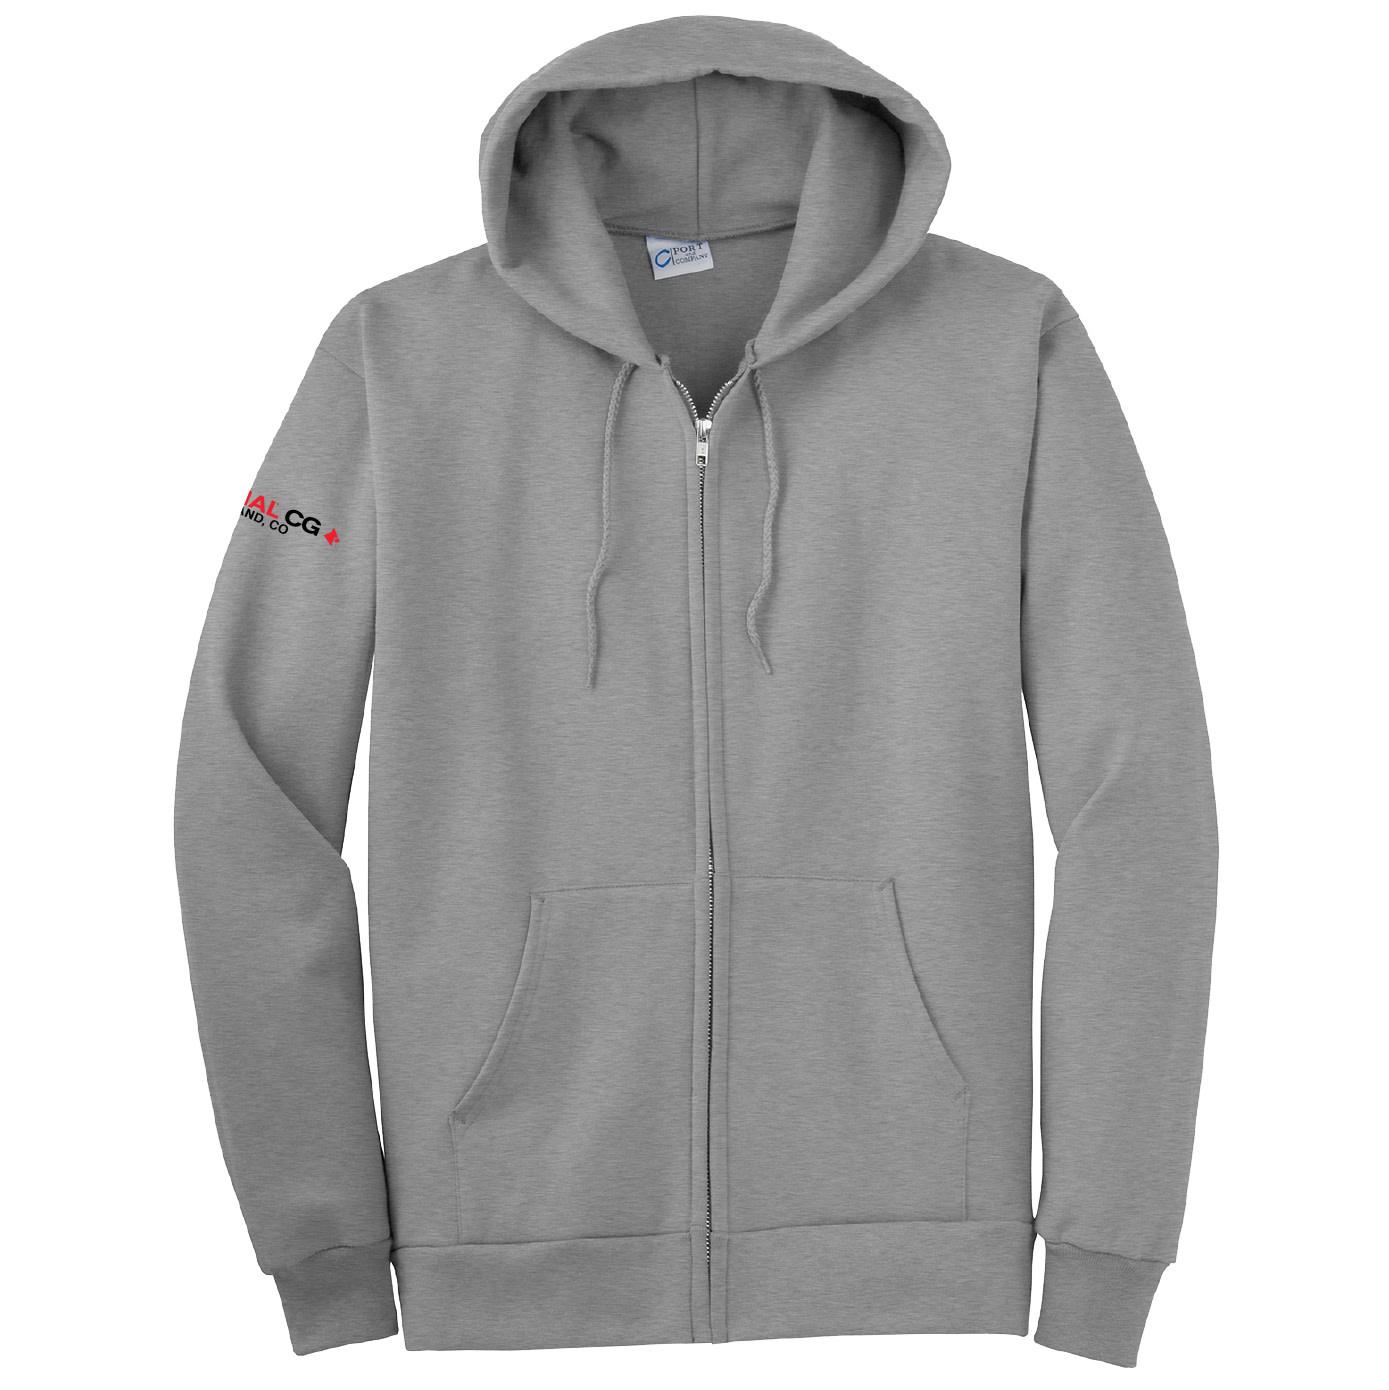 Port Authority Port & Company Essential Fleece Full-Zip Hooded Sweatshirt (Athletic Heather)